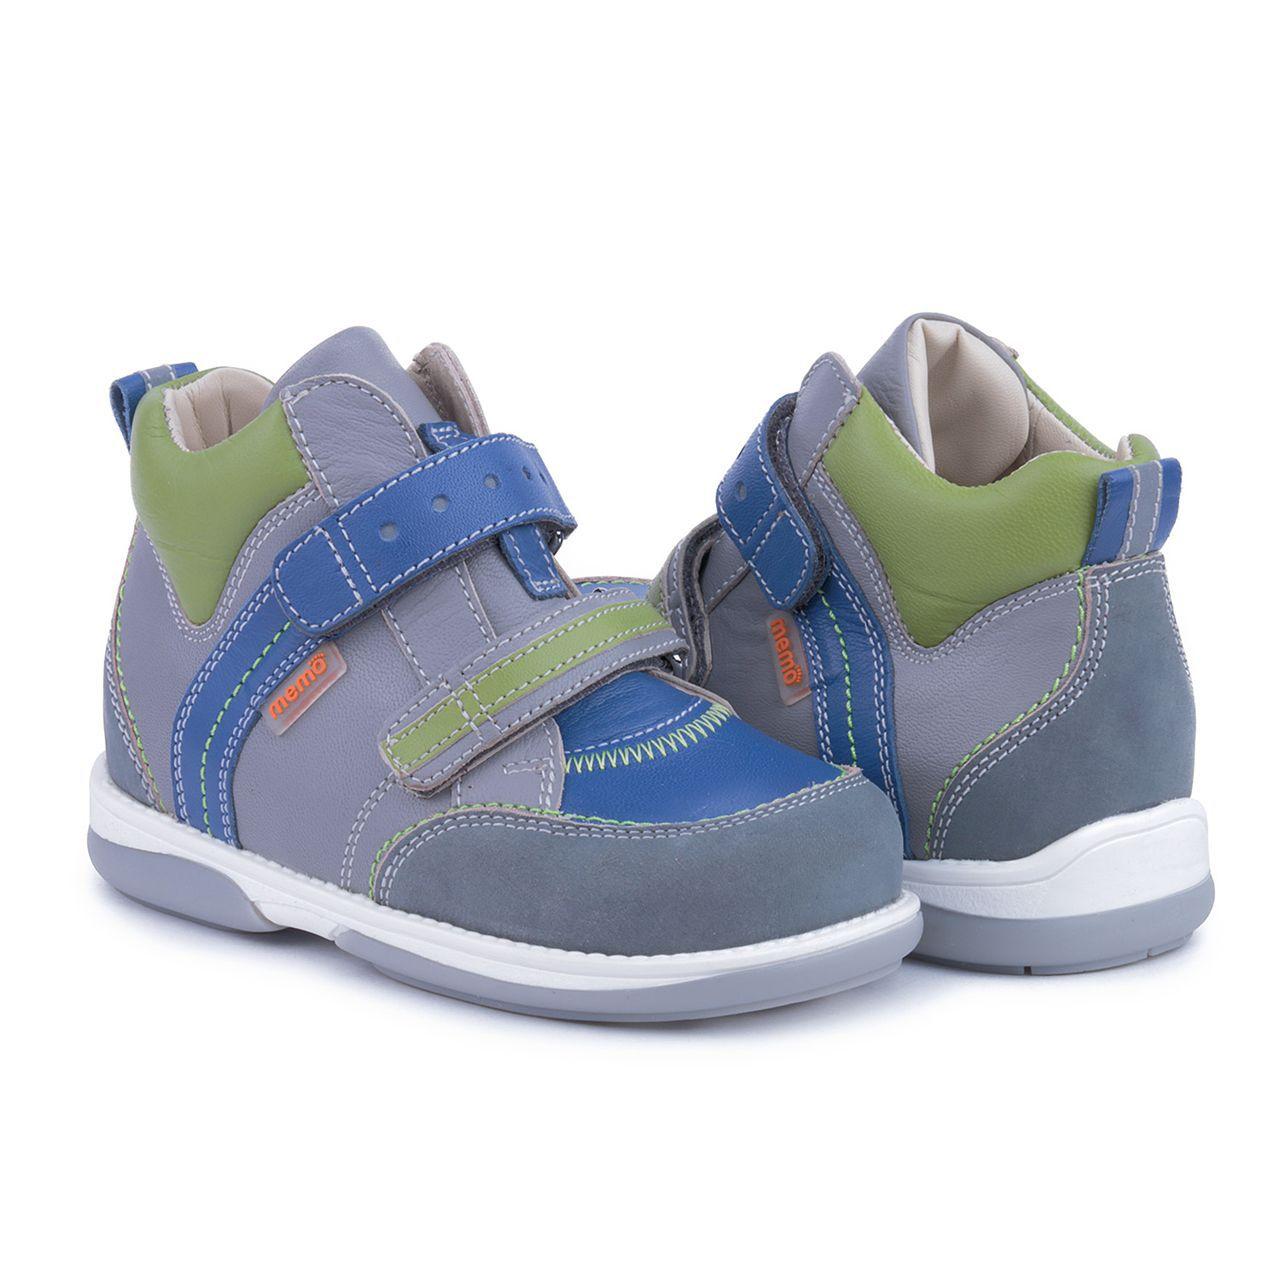 best sleek unique design Children orthopedic shoe - Memo Polo Junior 3BC - Memo Shoes